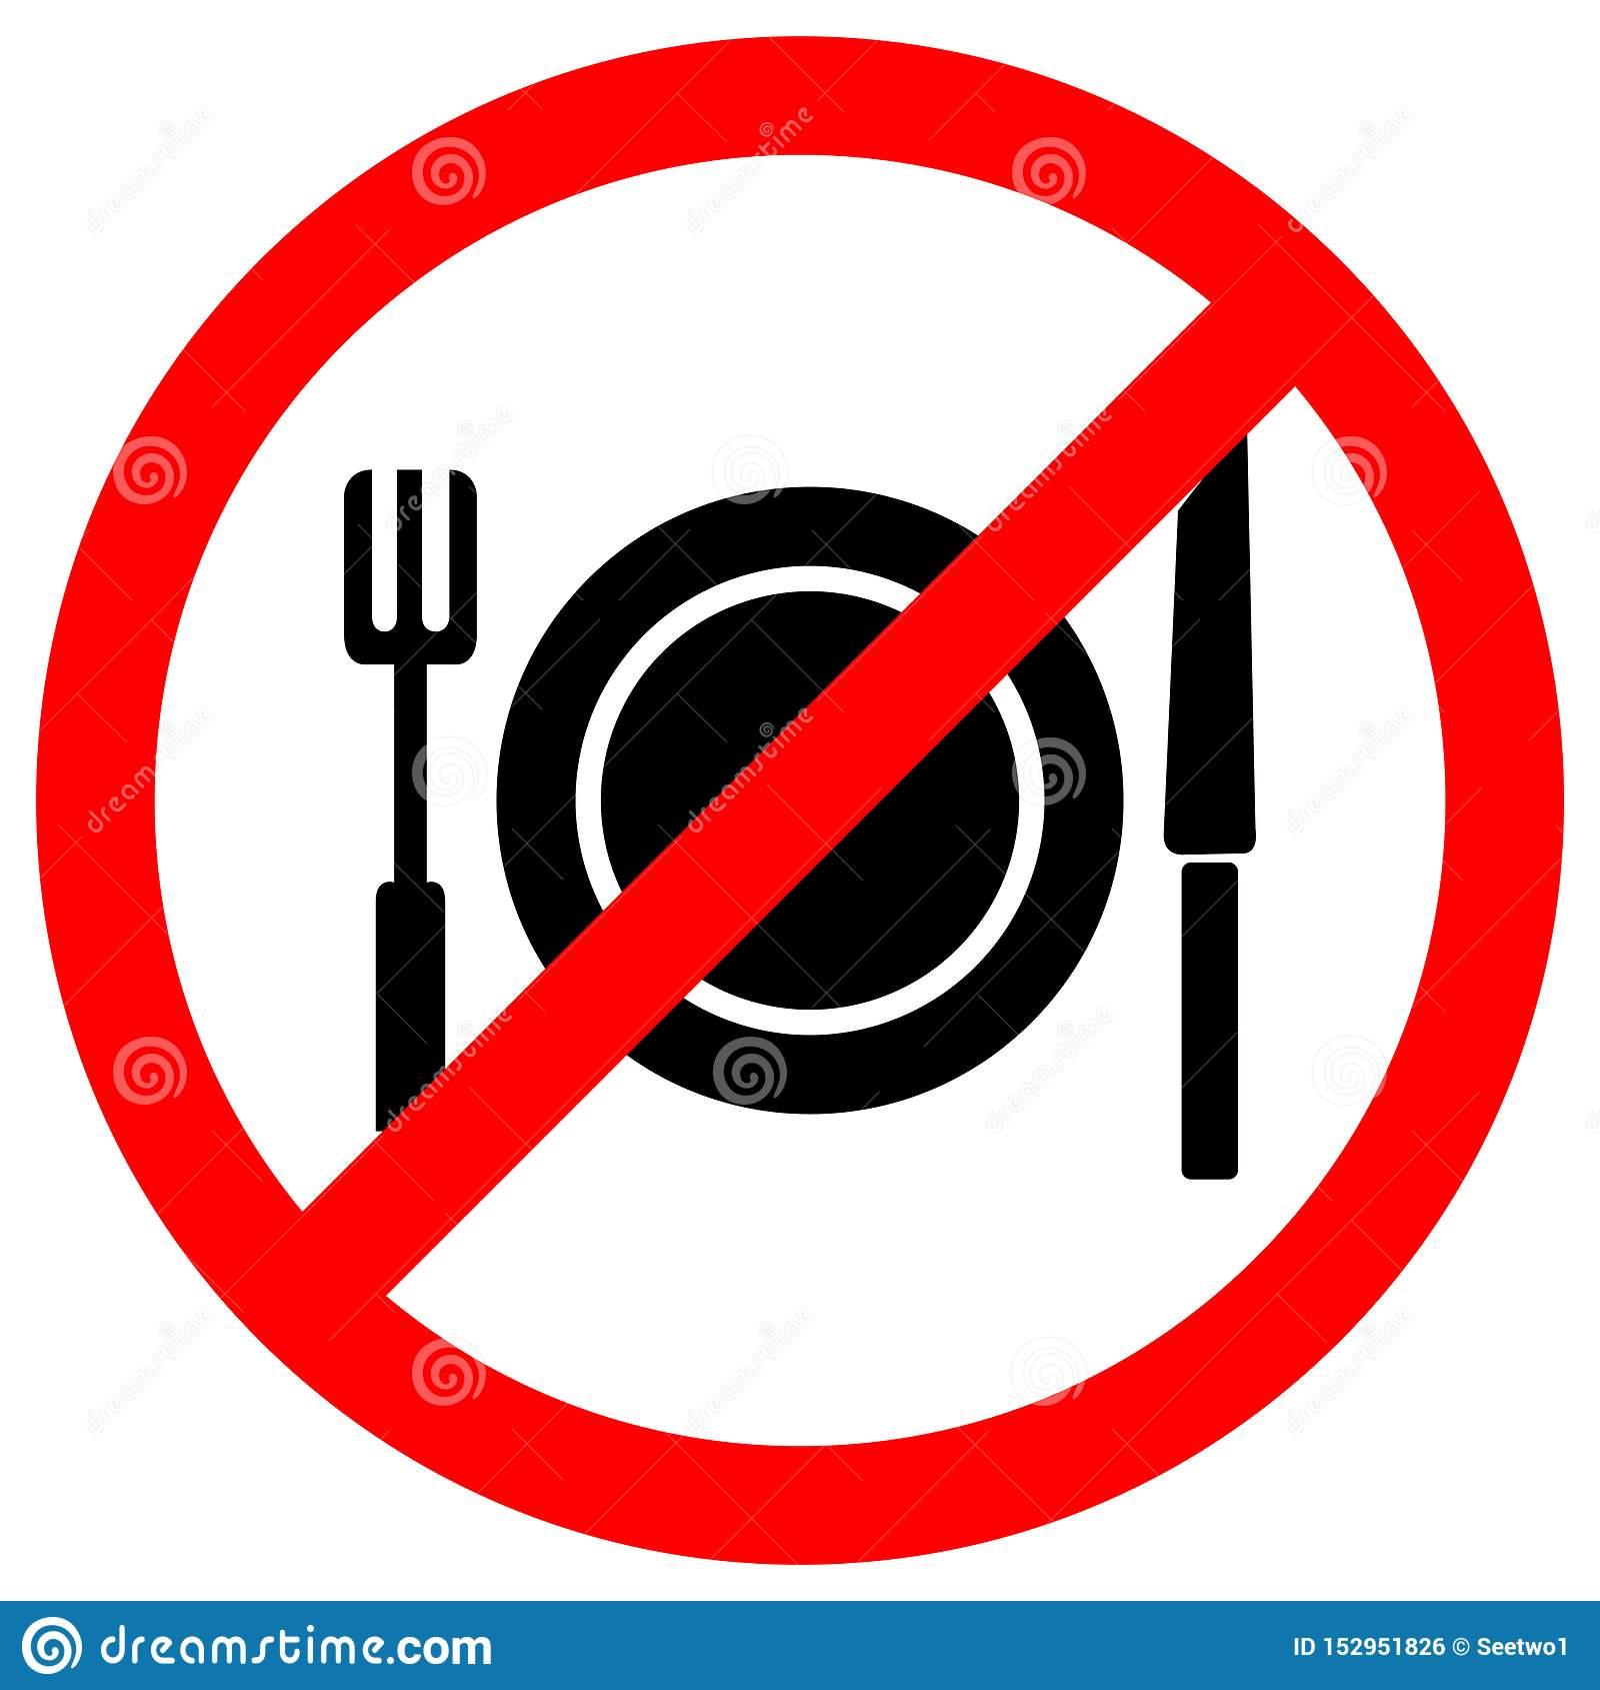 No Eating Symbol Sign Isolate On White Background,Vector Illustration EPS.10